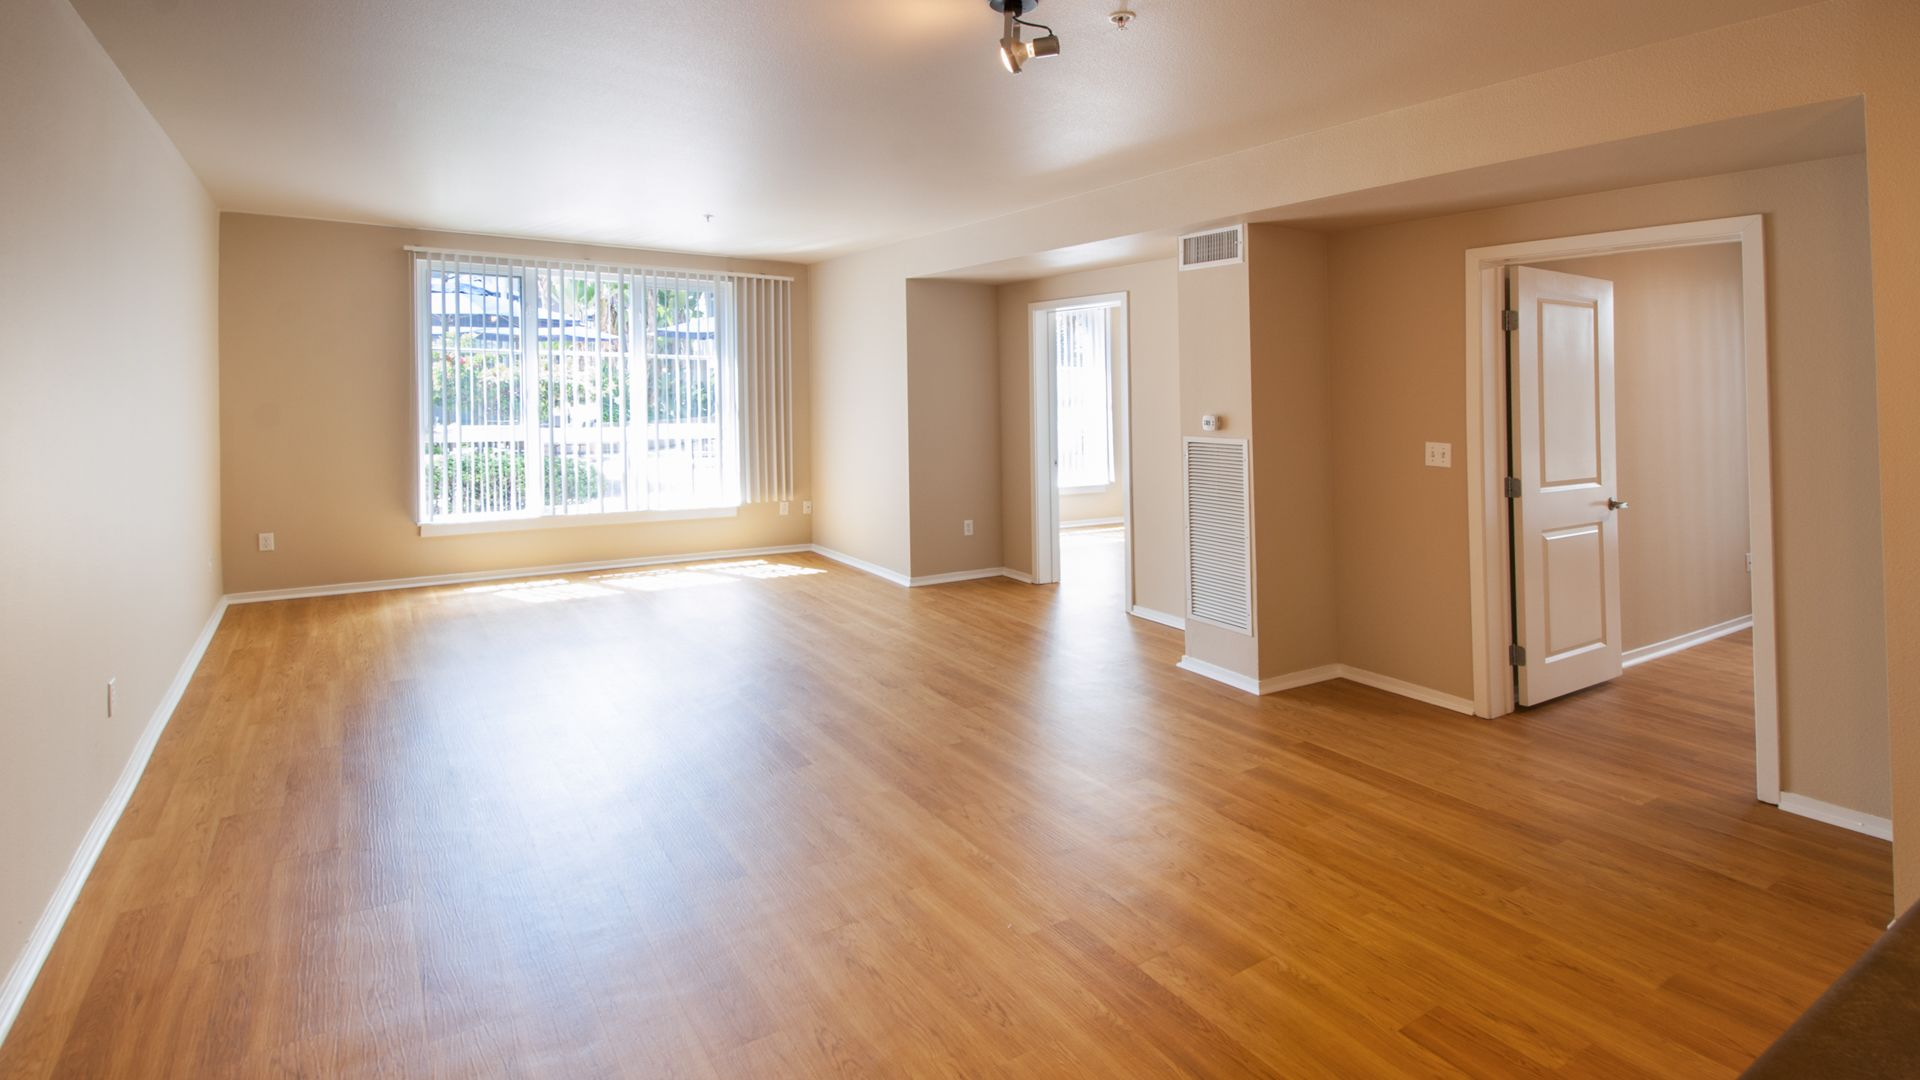 Market Street Village Apartments - Living Room